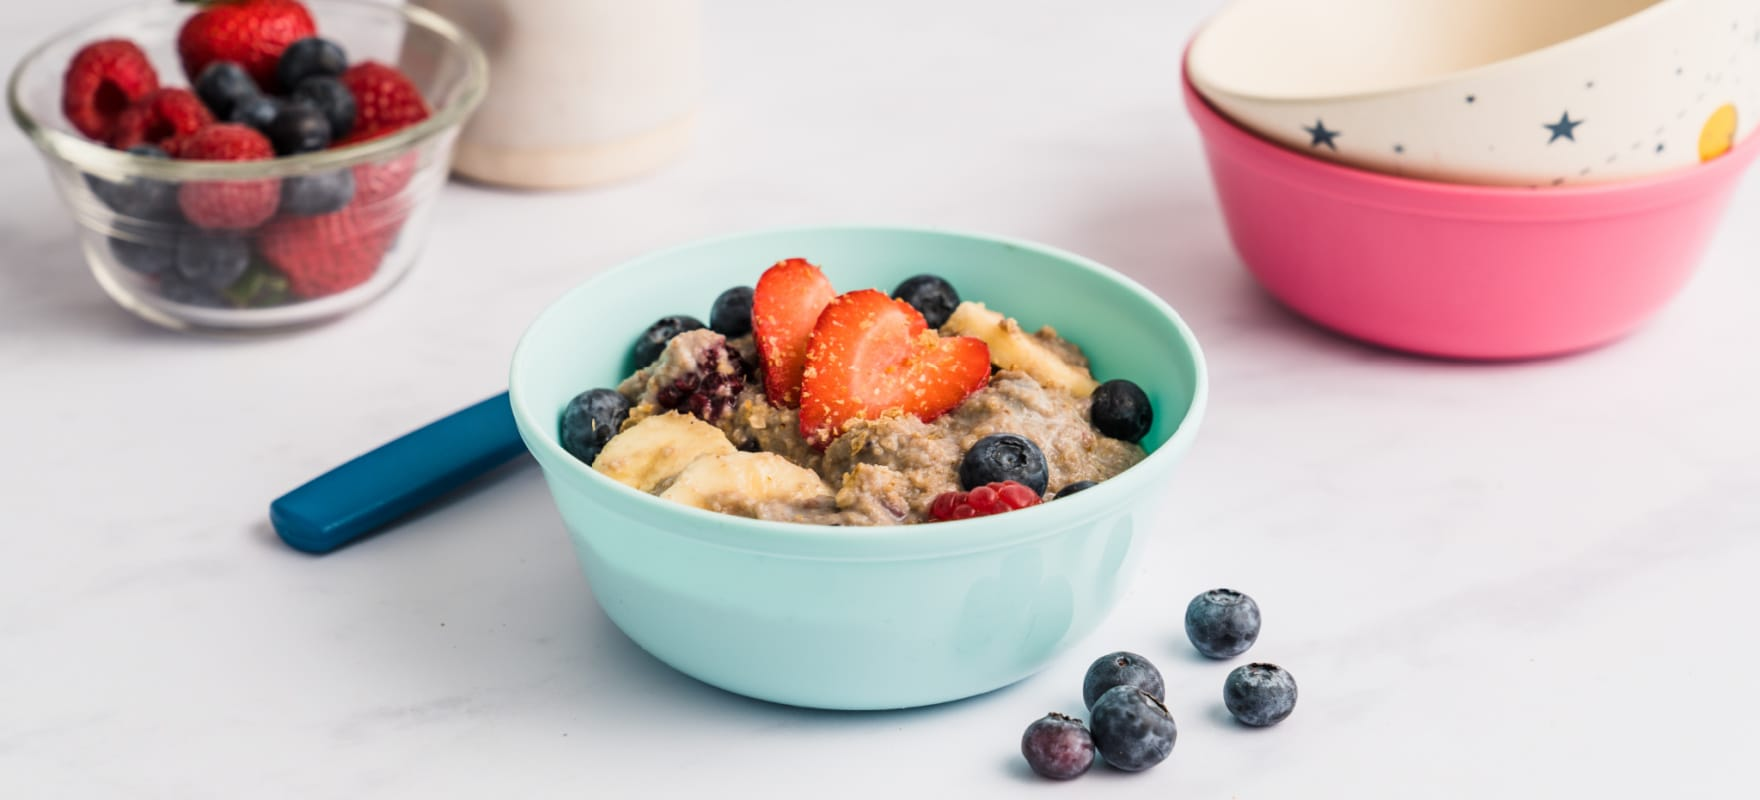 Warm banana-berry Weet-Bix porridge image 1